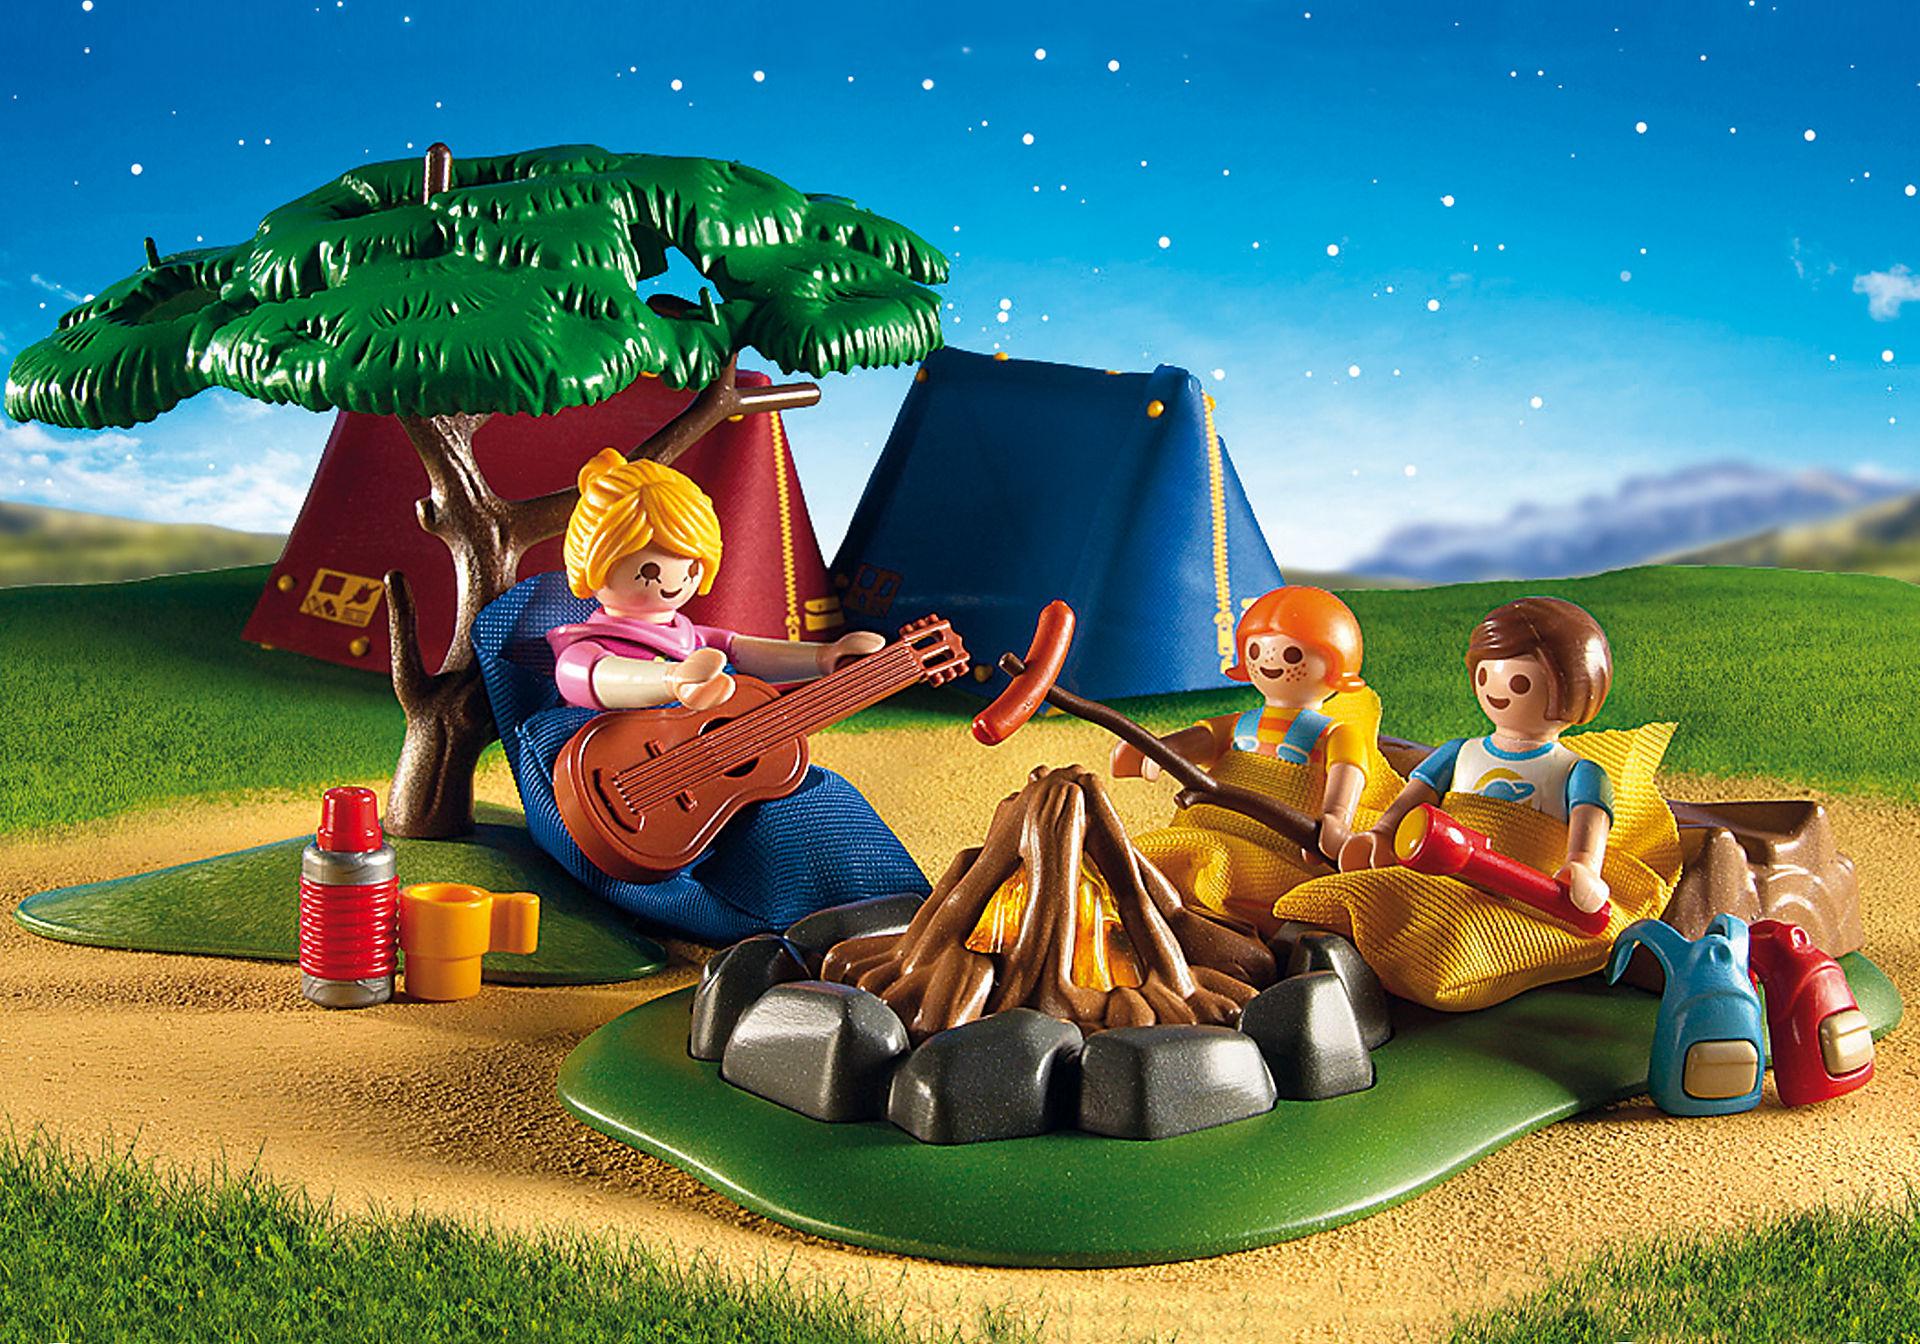 http://media.playmobil.com/i/playmobil/9153_product_extra1/Campamento con Fogata